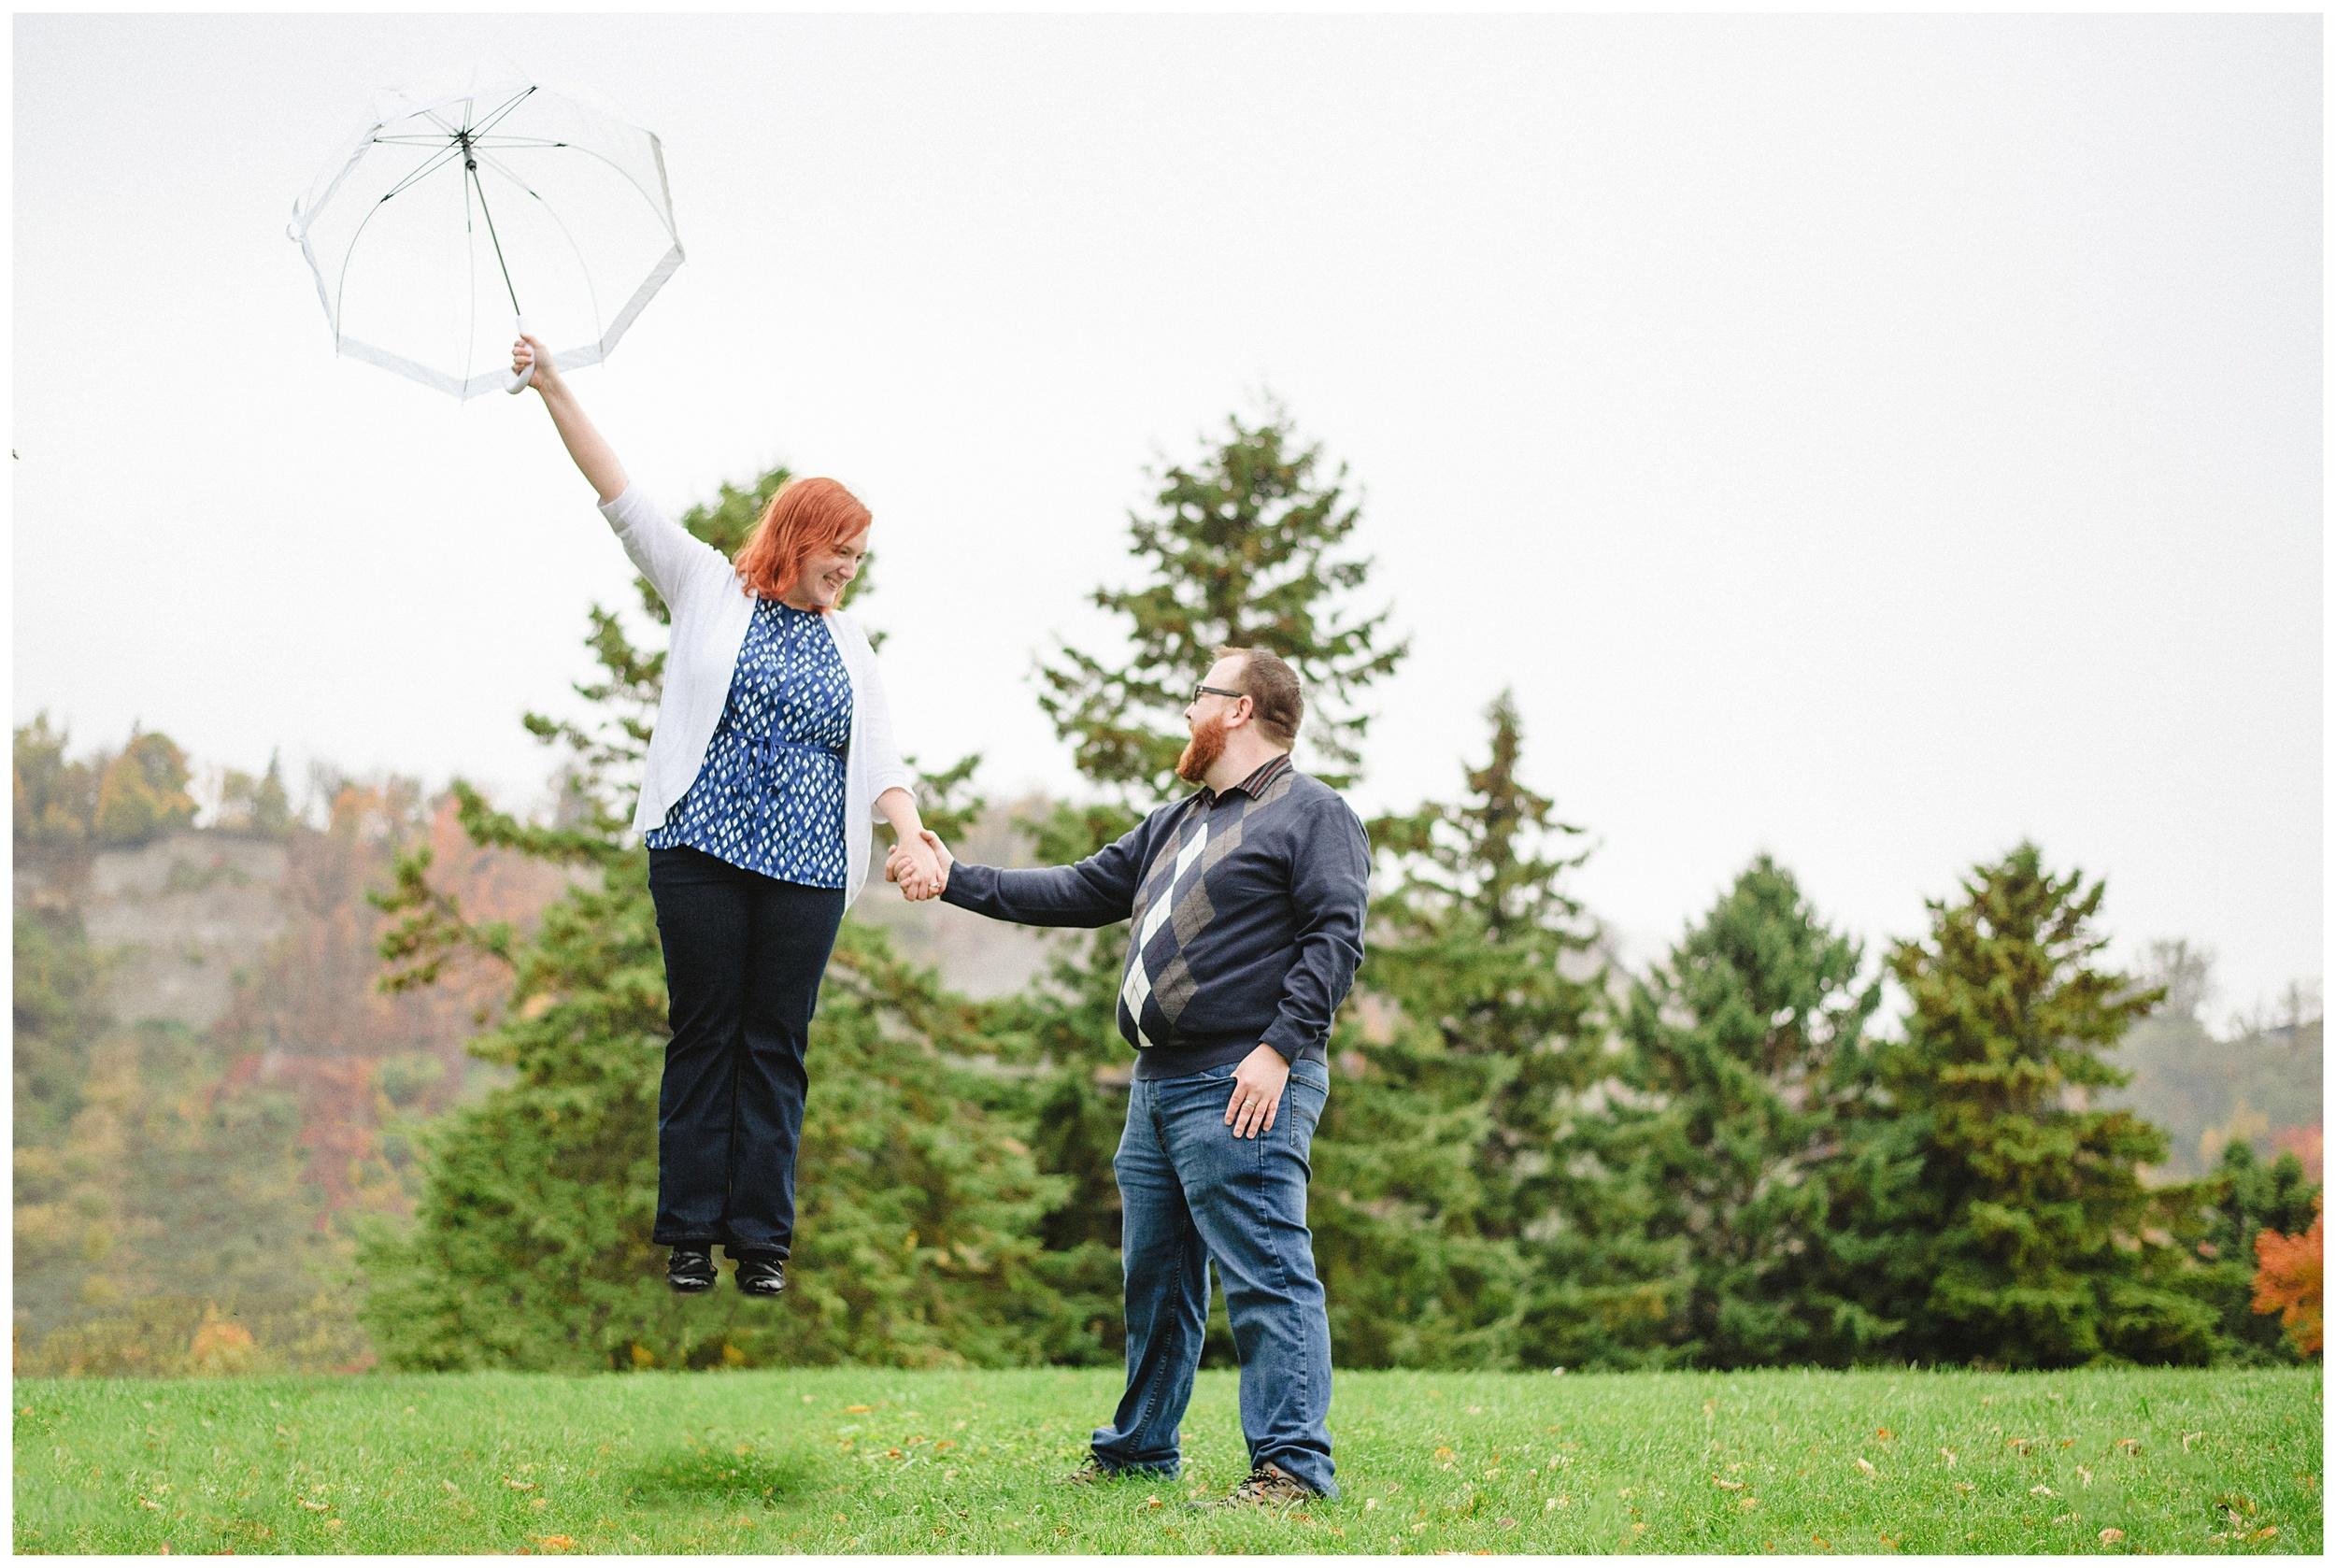 Arynn Photography, Scarborough Bluffs engagement shoot, Toronto Weddding Photographer, Durham Wedding Photographer, Geeky Engagement, umbrella, Mary Poppins Engagement